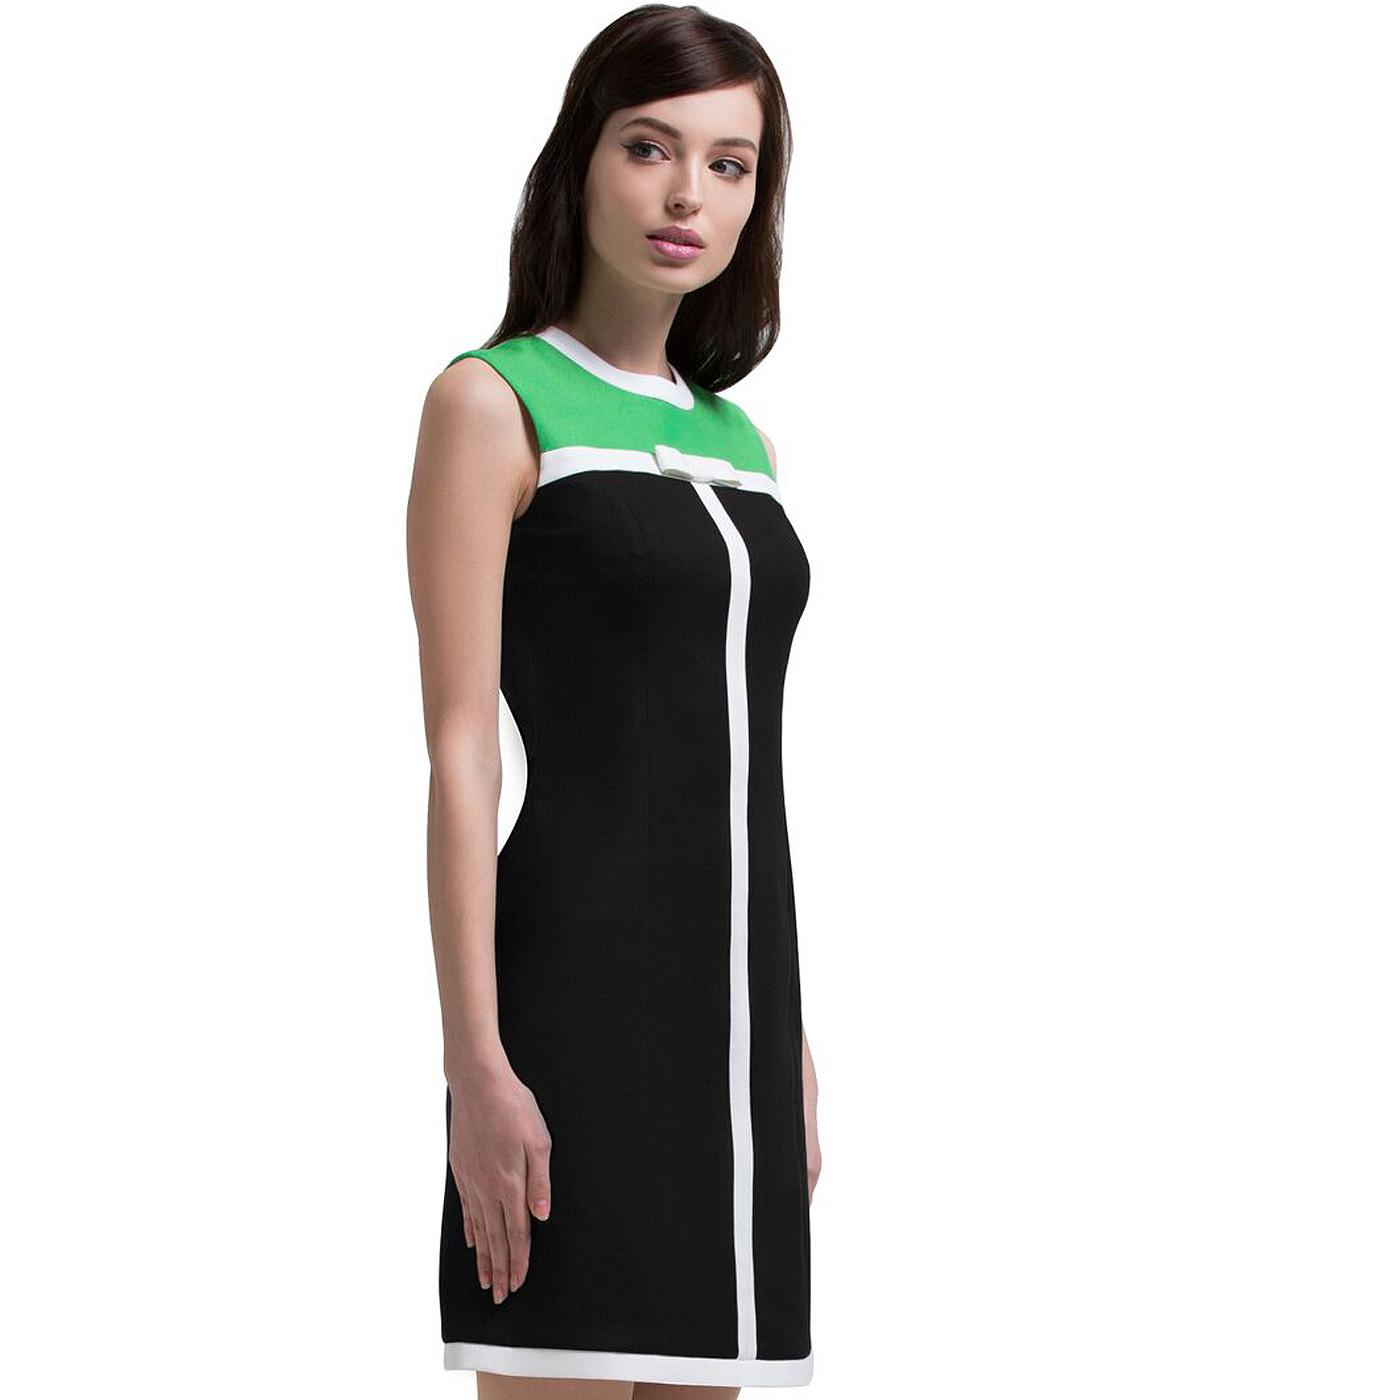 MARMALADE Retro 60s Mod Bow Dress in Black/Green